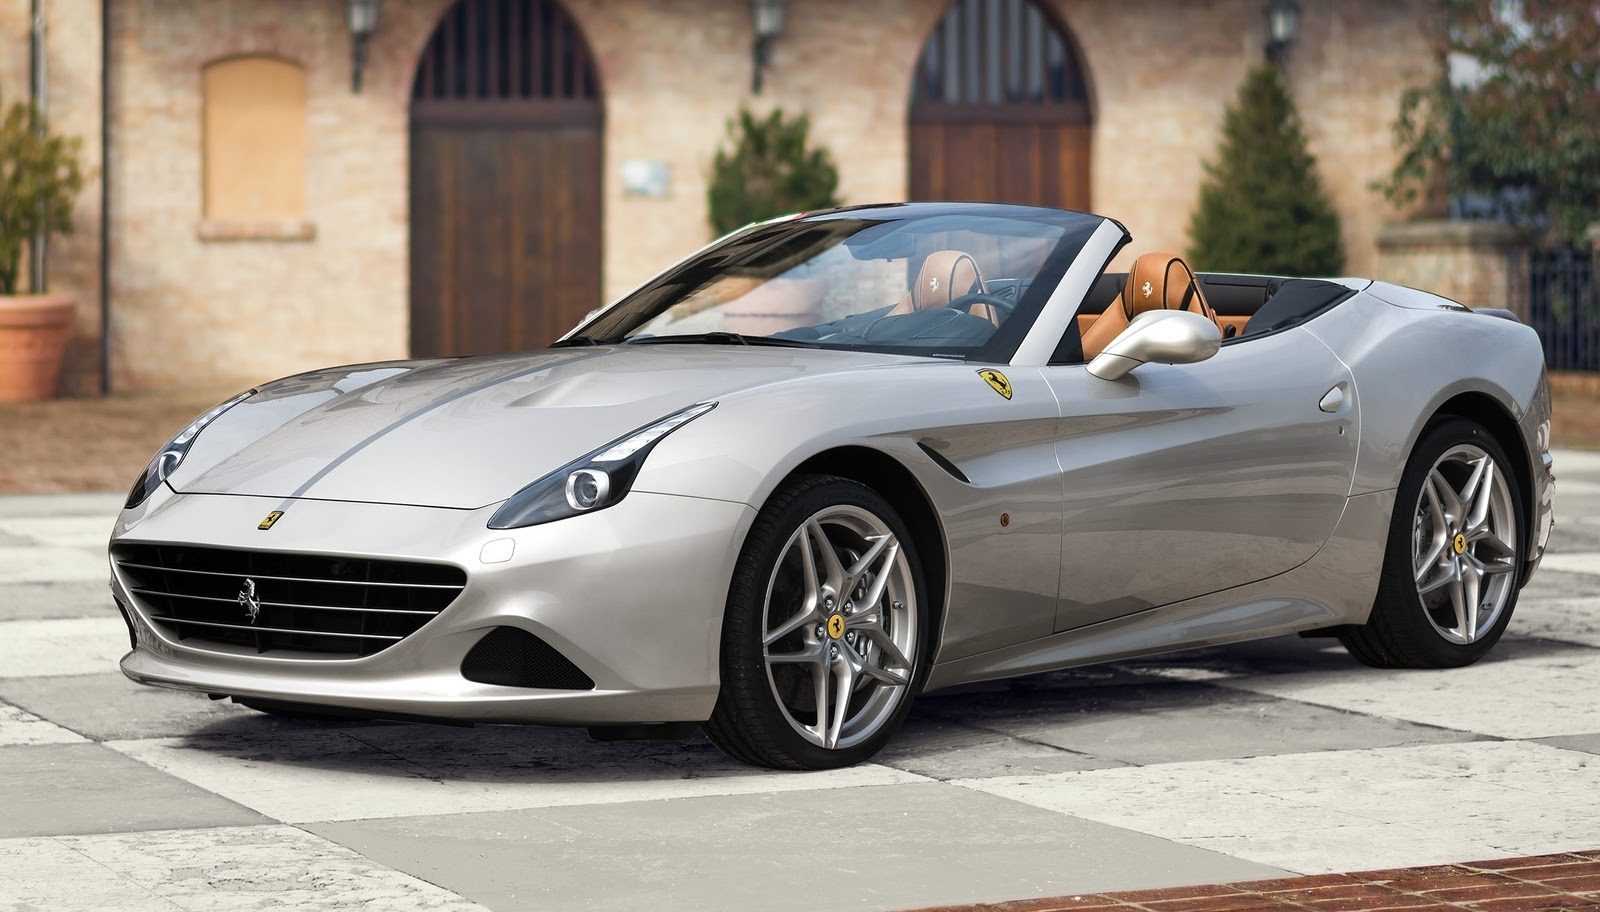 2015 Ferrari California - Review - CarGurus